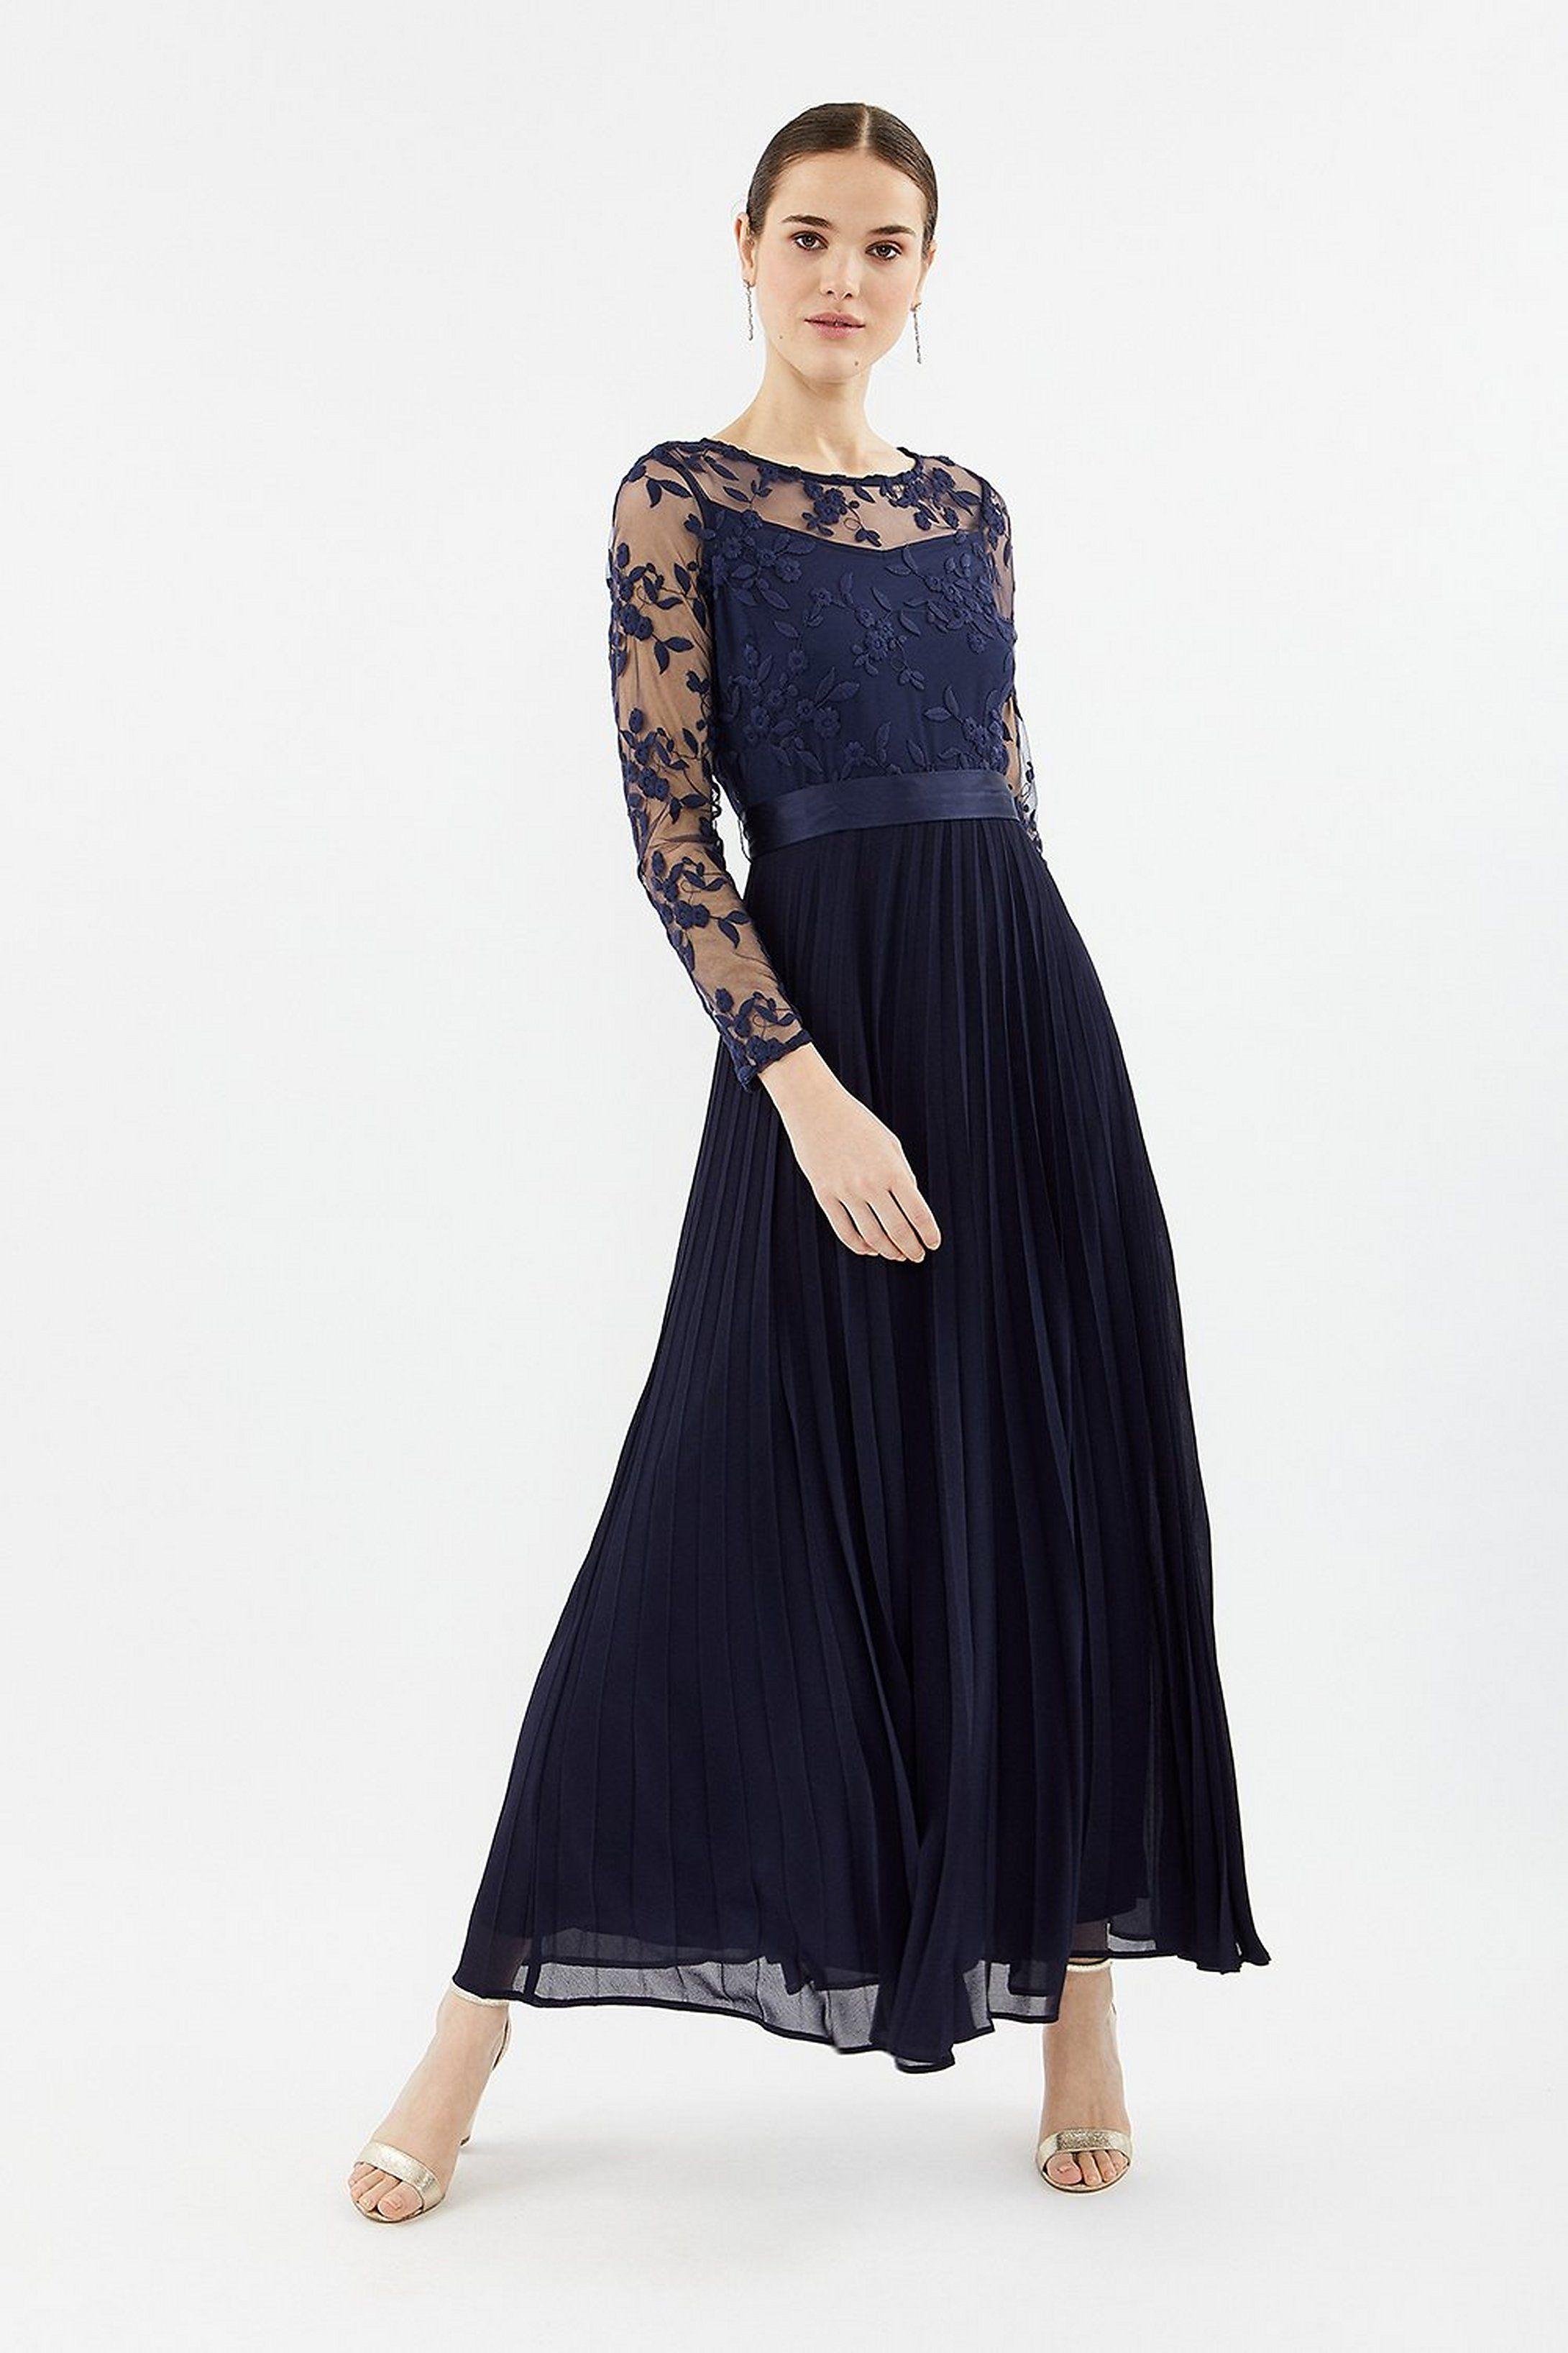 Awaken My Love Burgundy Long Sleeve Lace Maxi Dress in